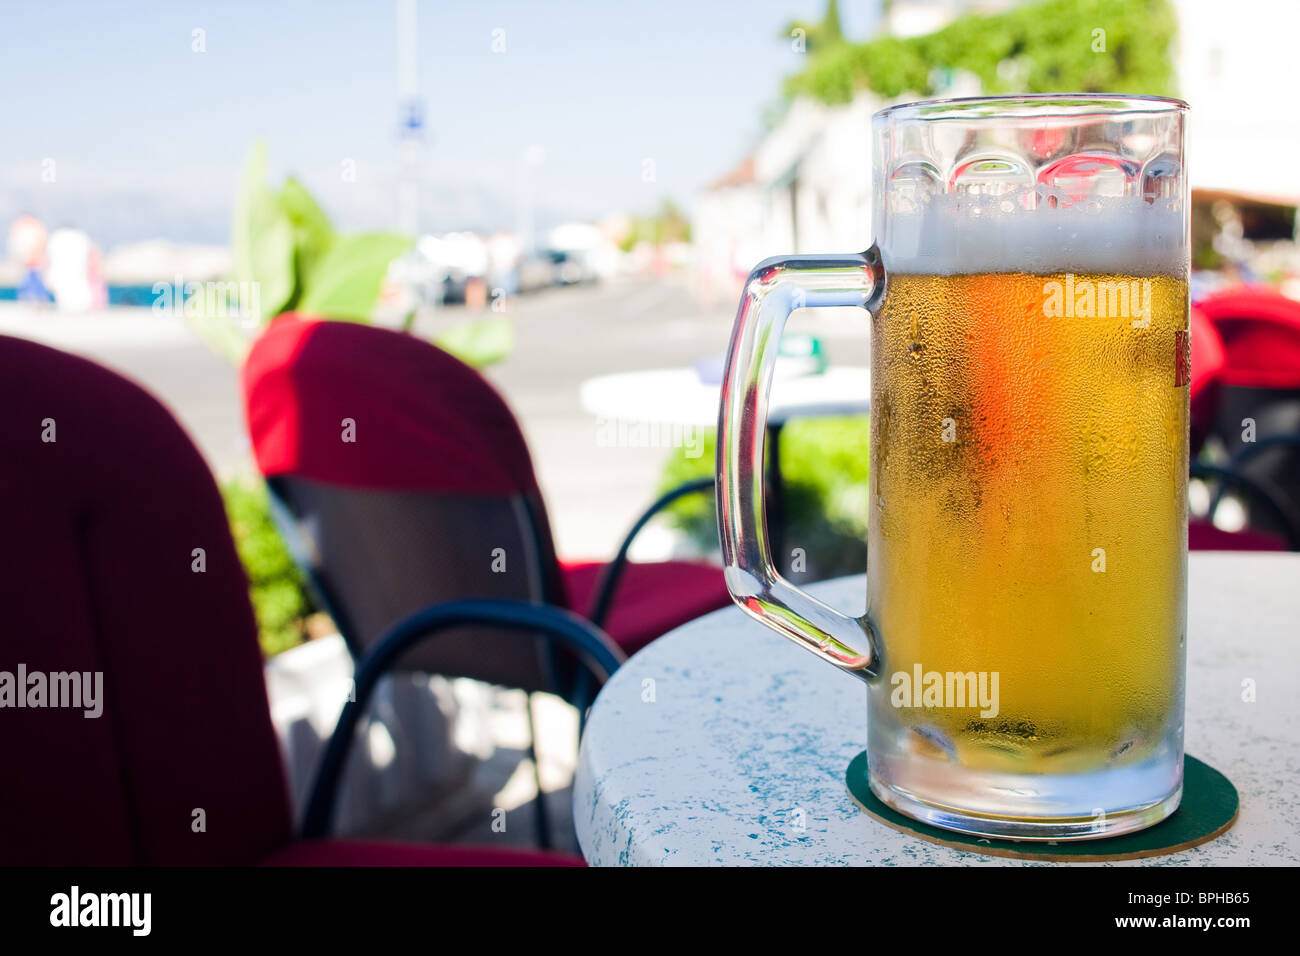 Jarra de cerveza en la mesa Imagen De Stock